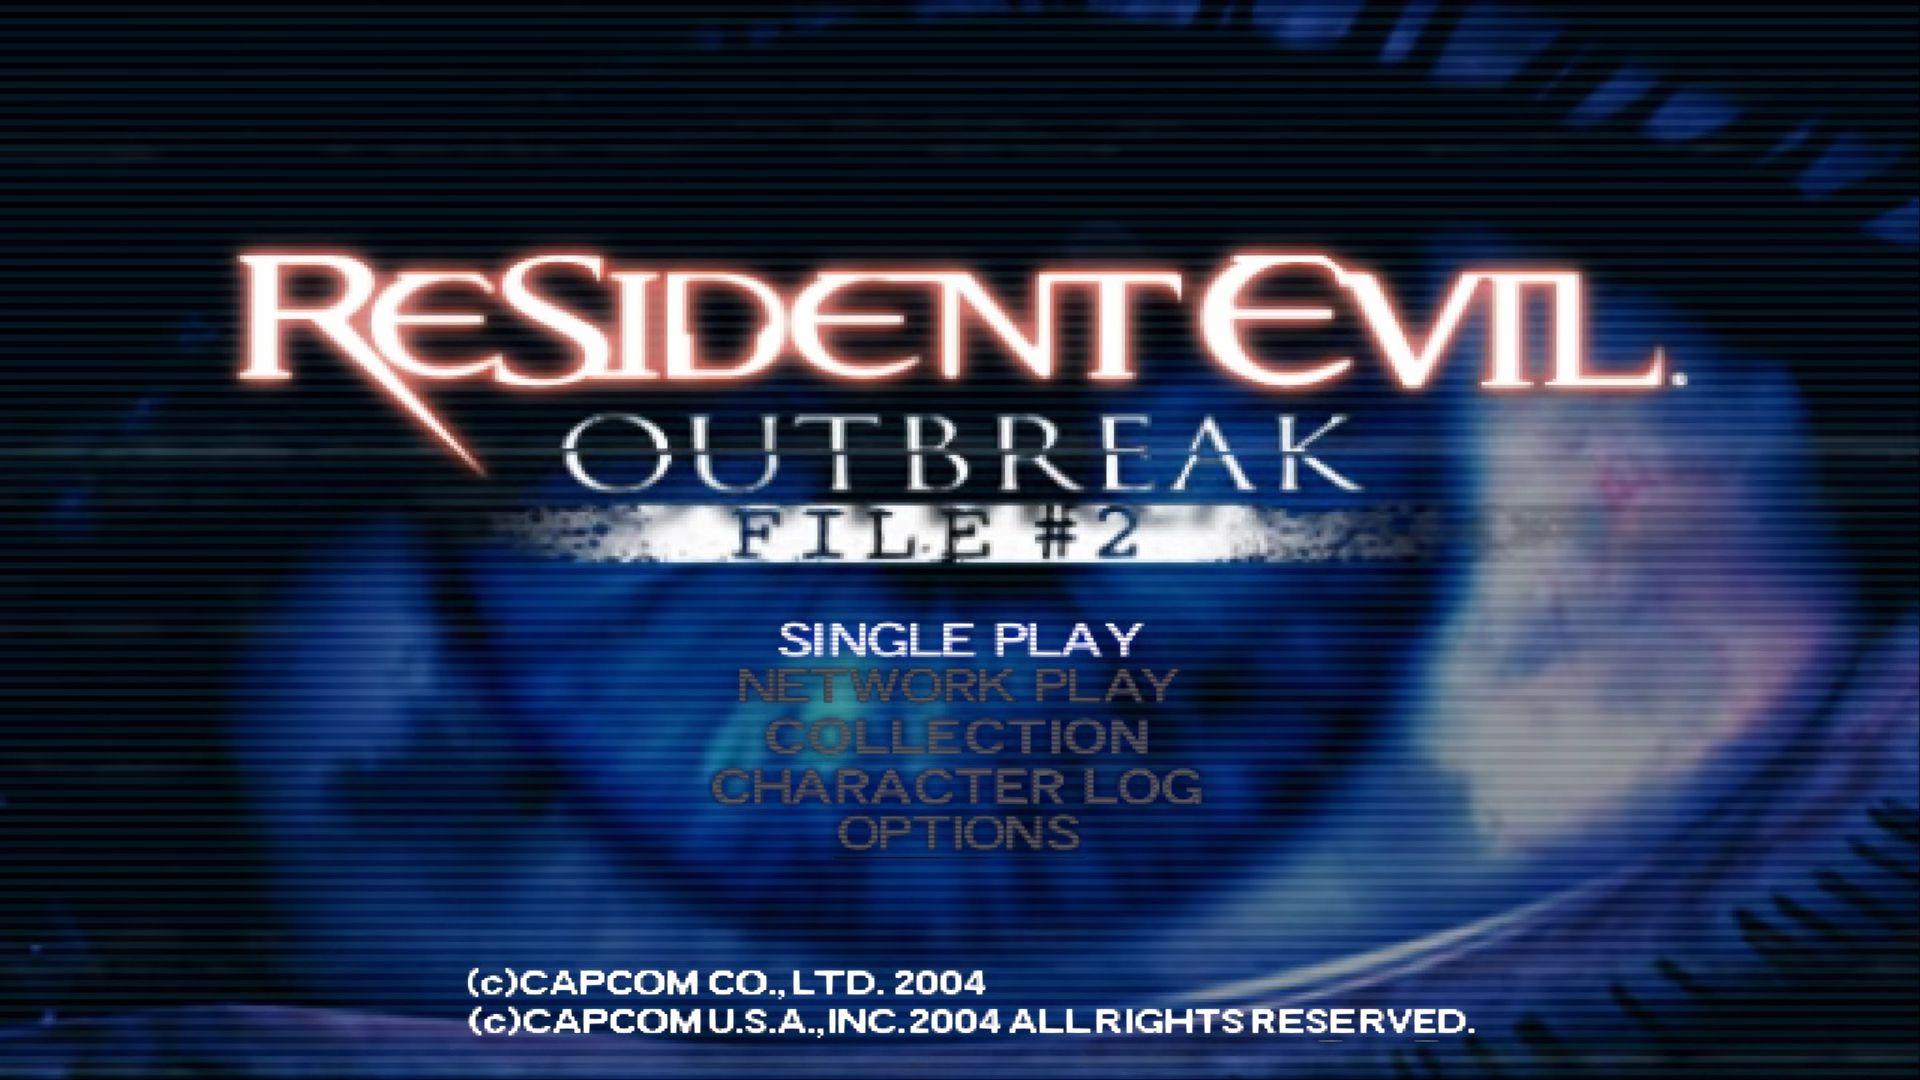 Resident Evil Outbreak File 2 title screen